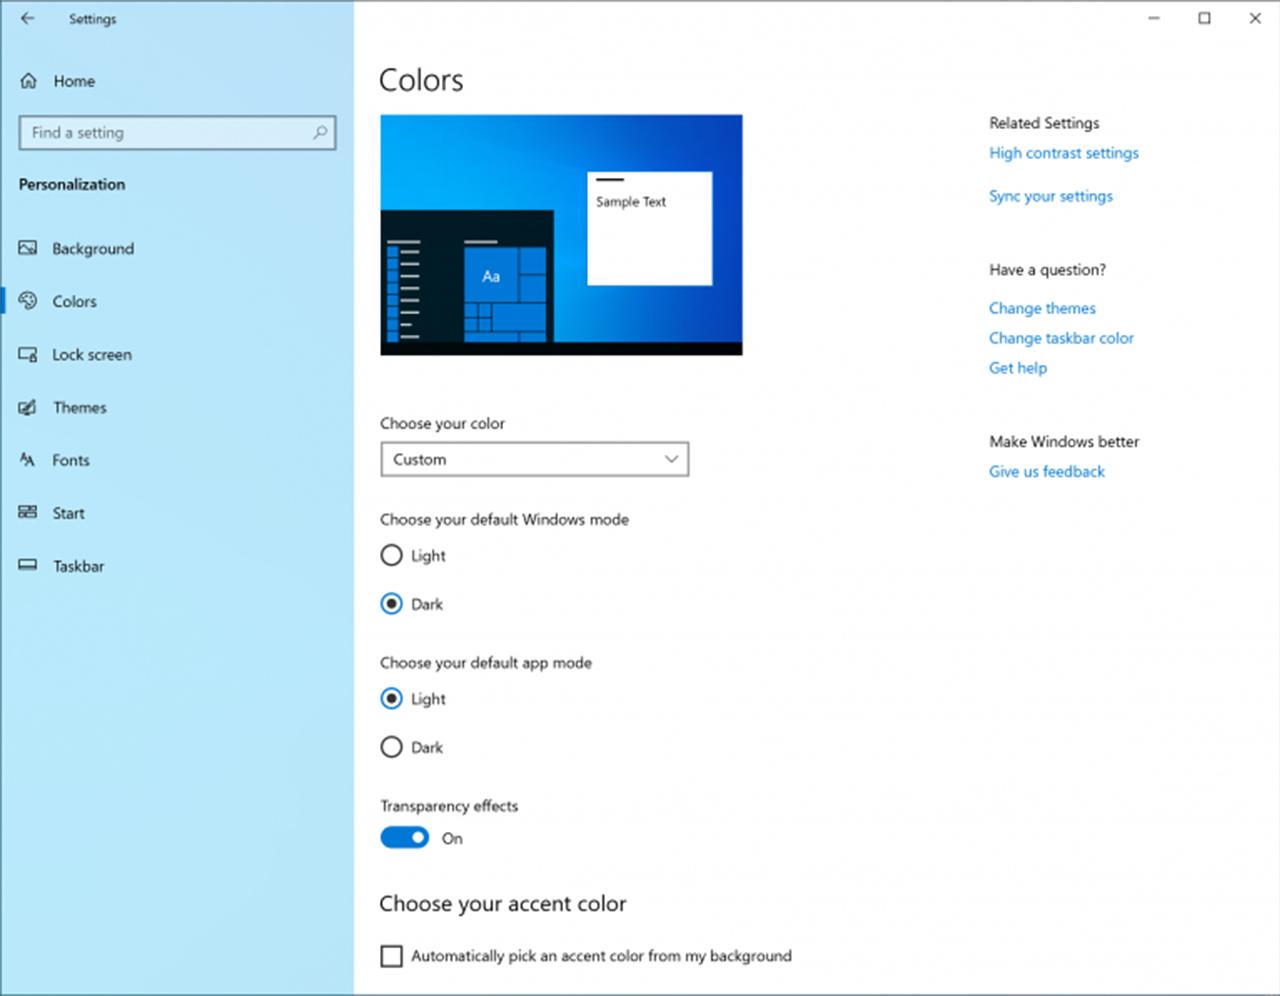 Windows 10 Personalization Photos